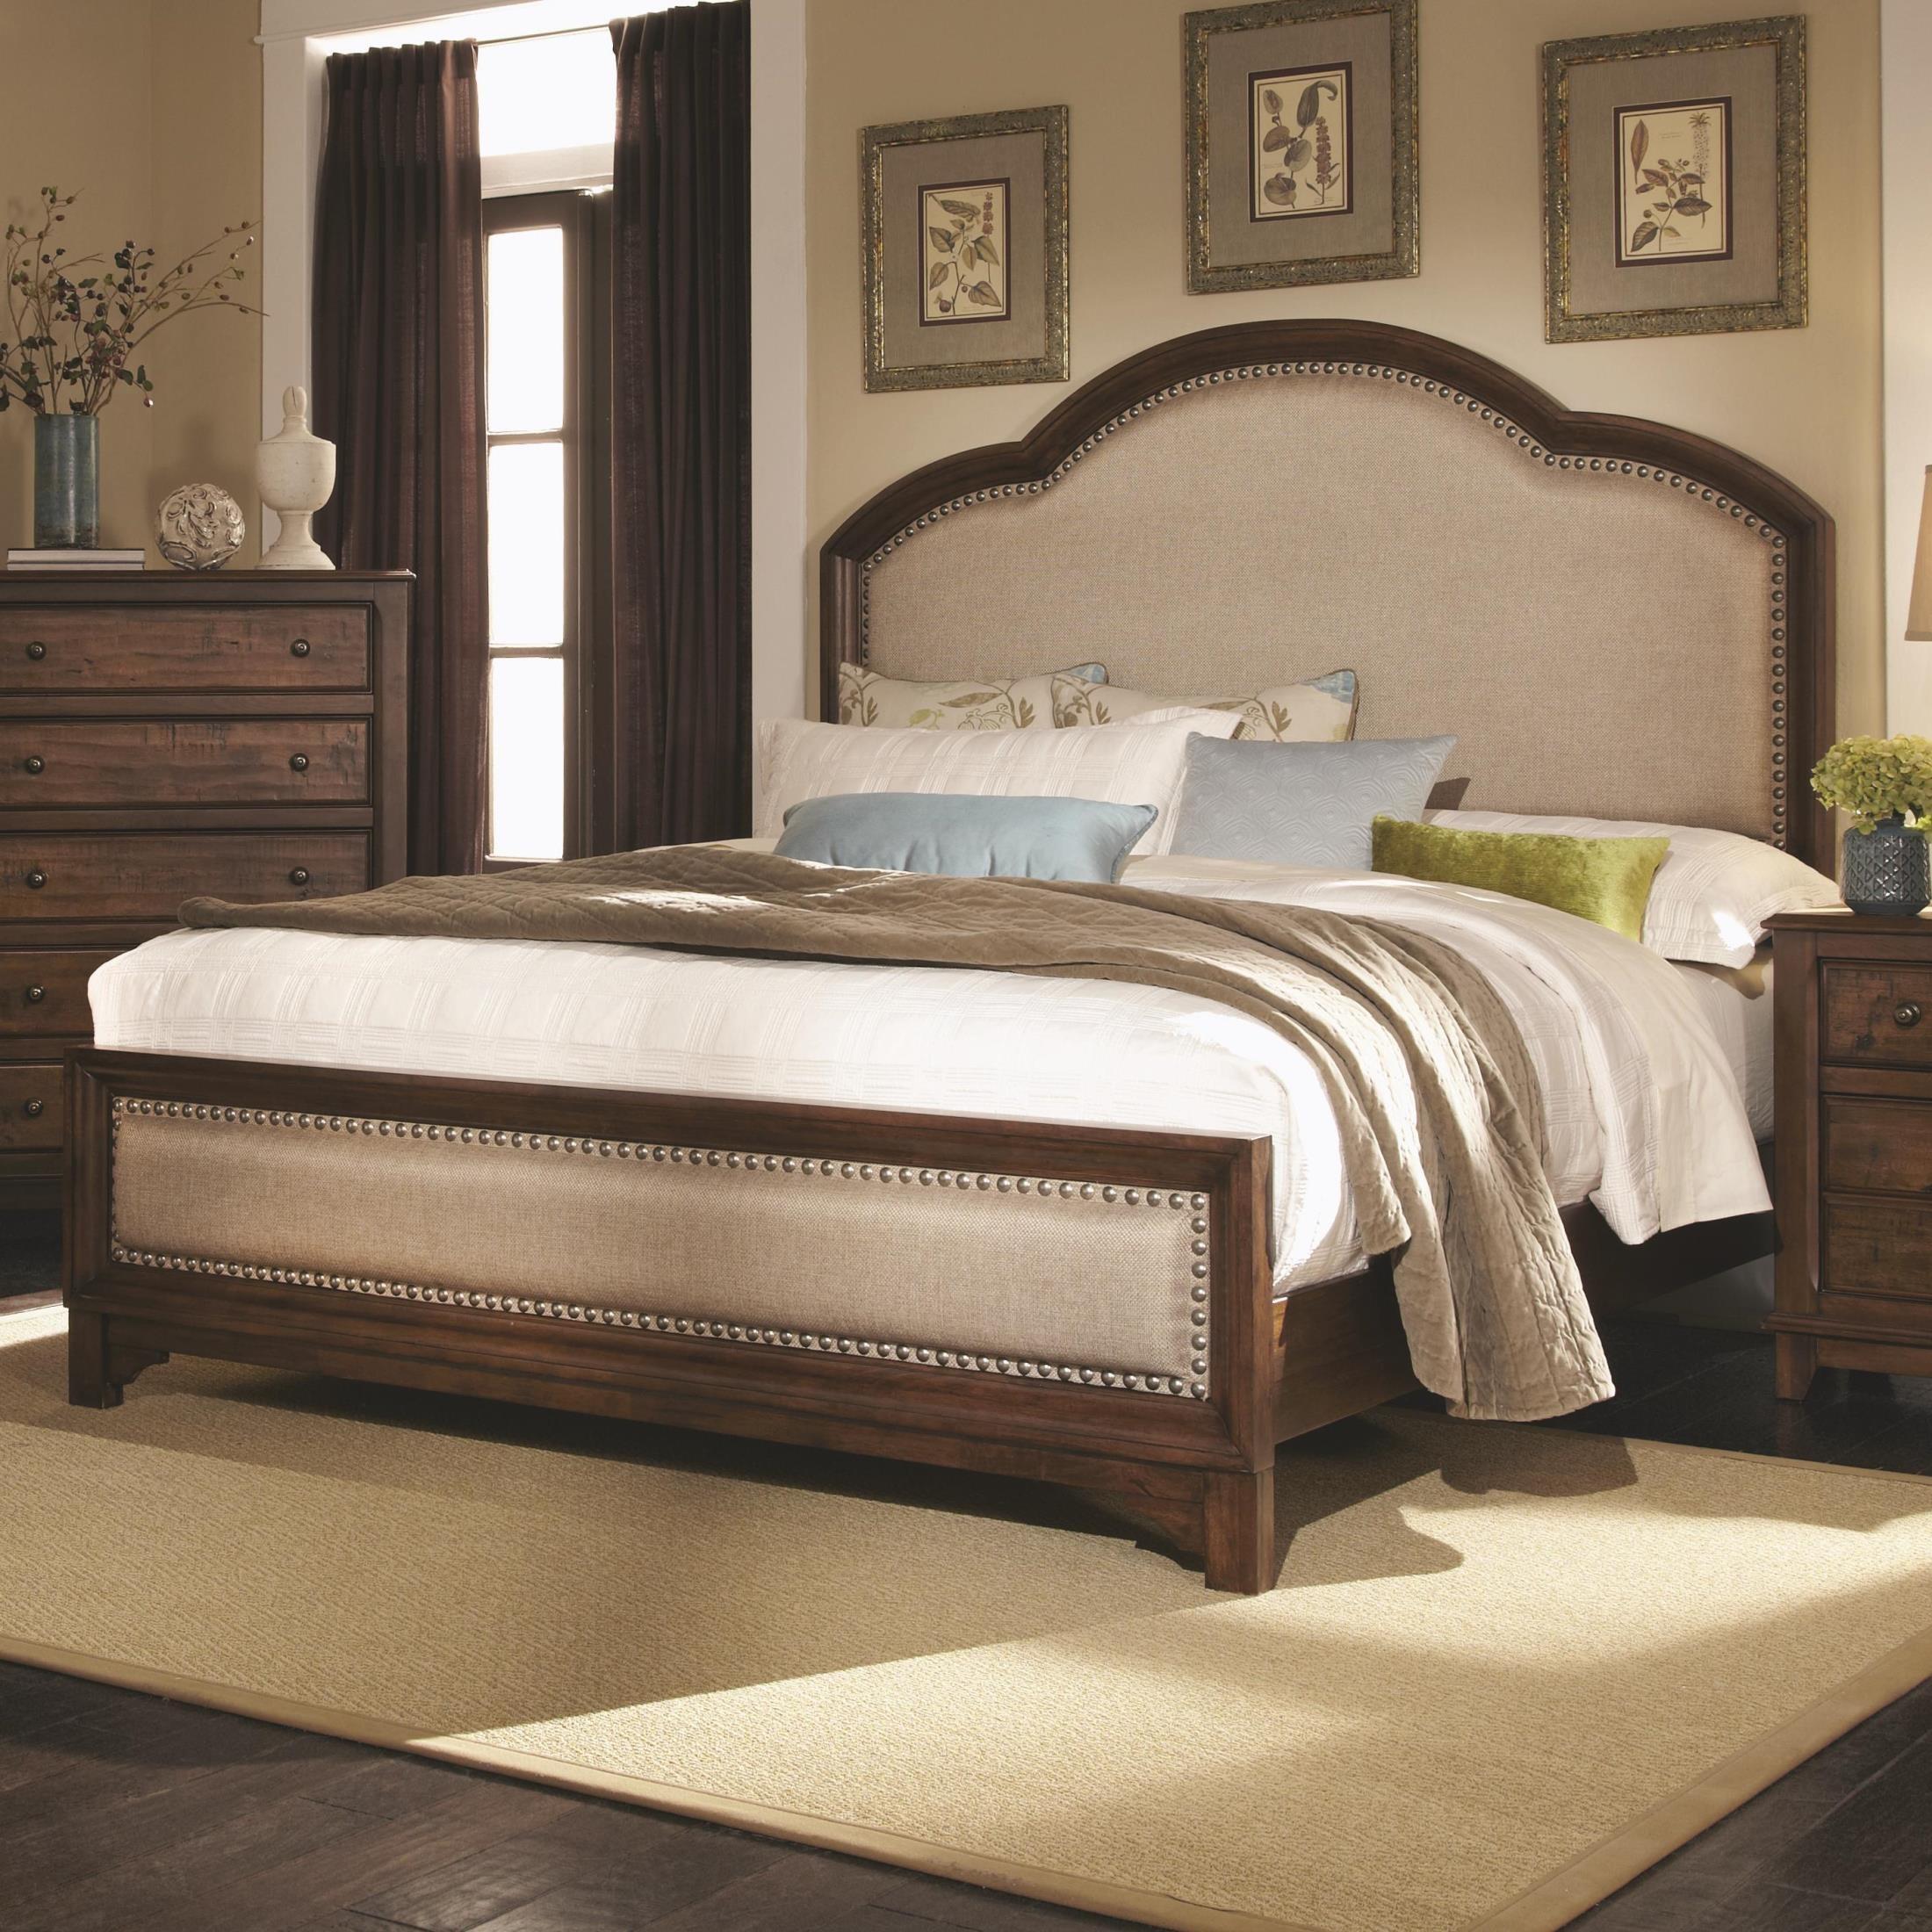 Coaster Laughton King Bed